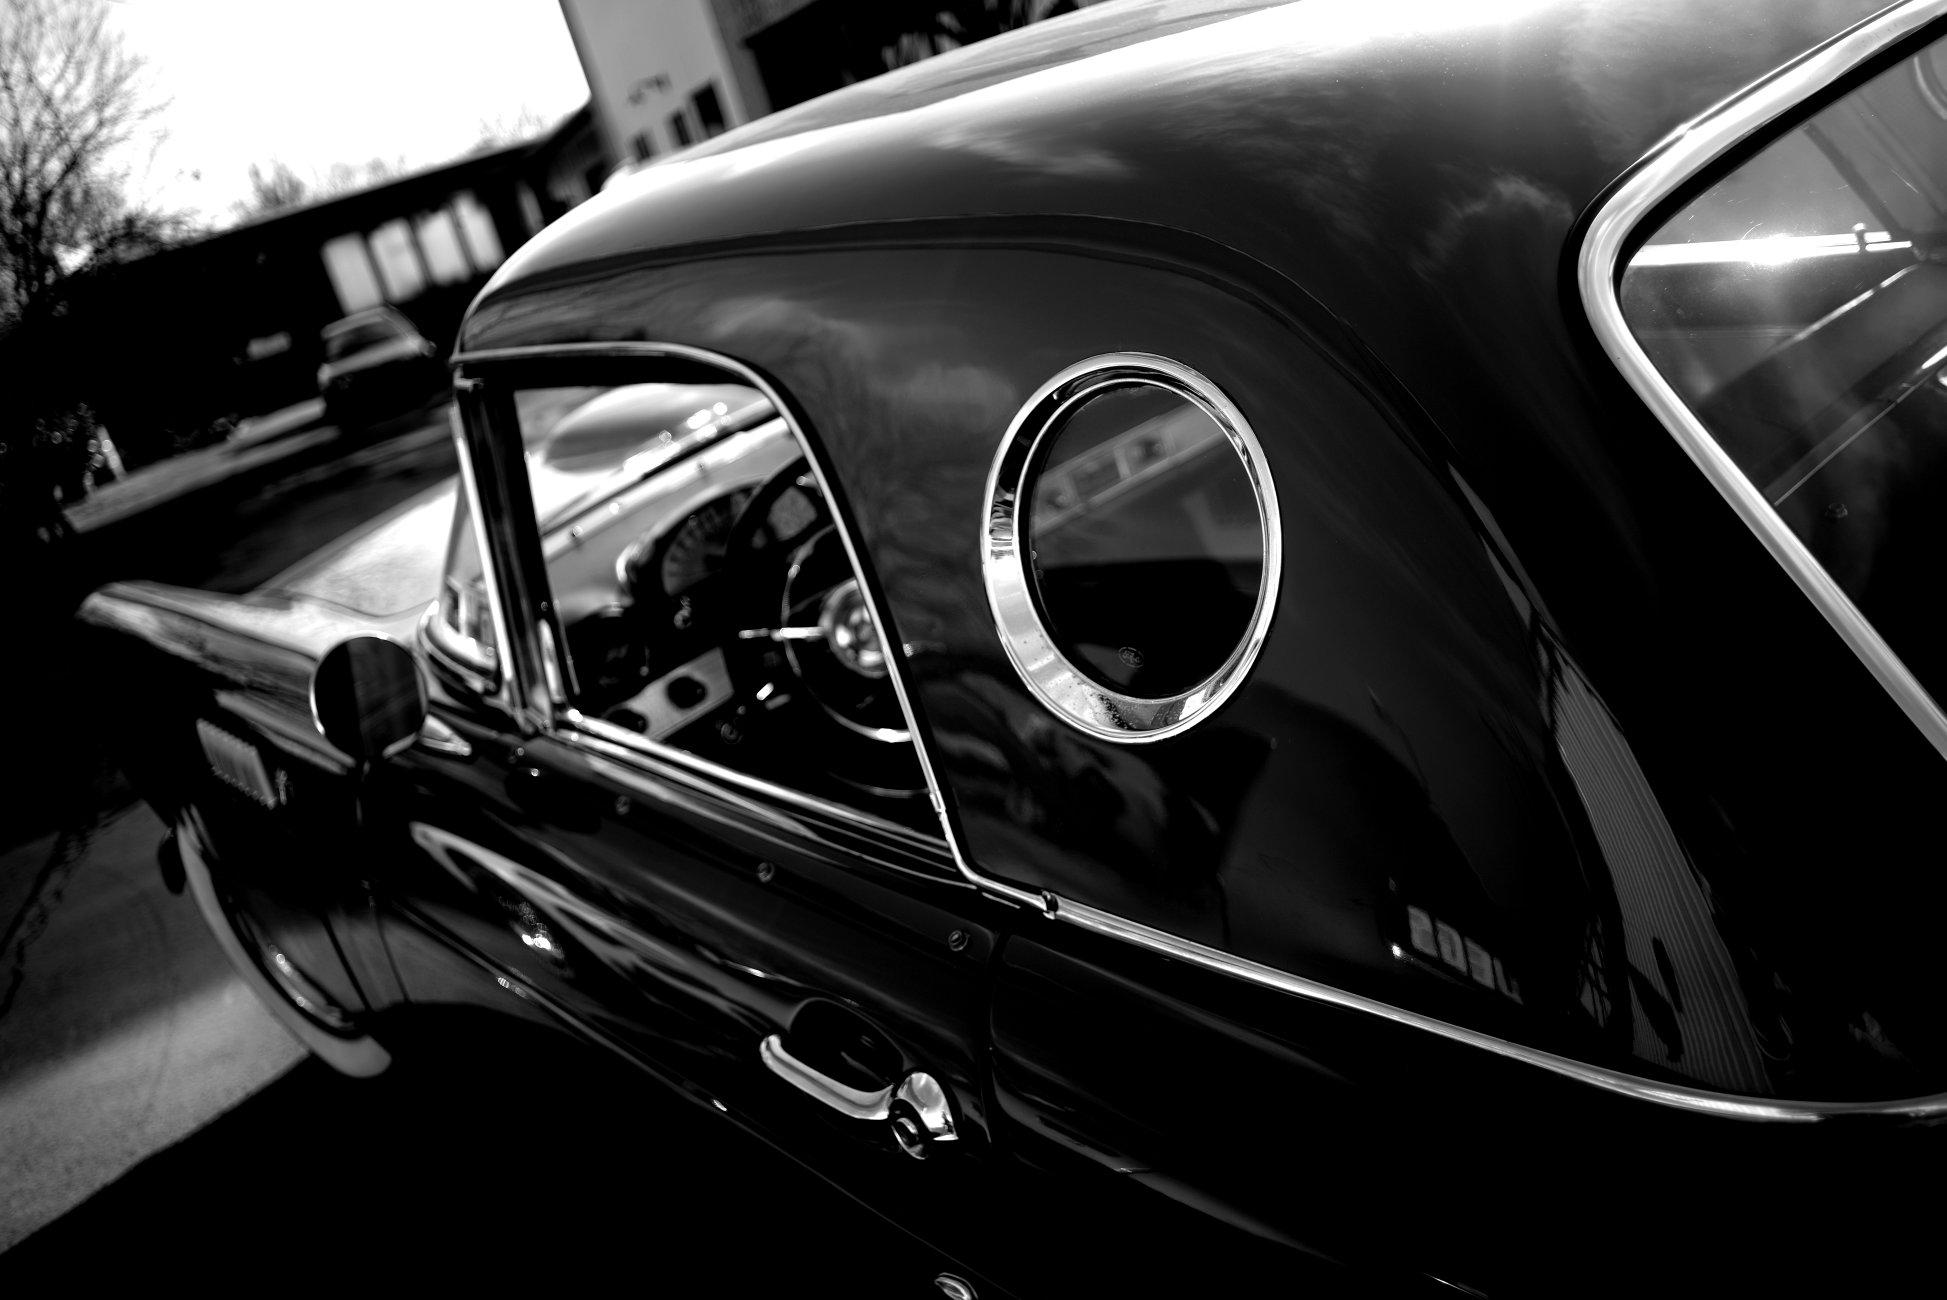 Ford Thunderbird Detail